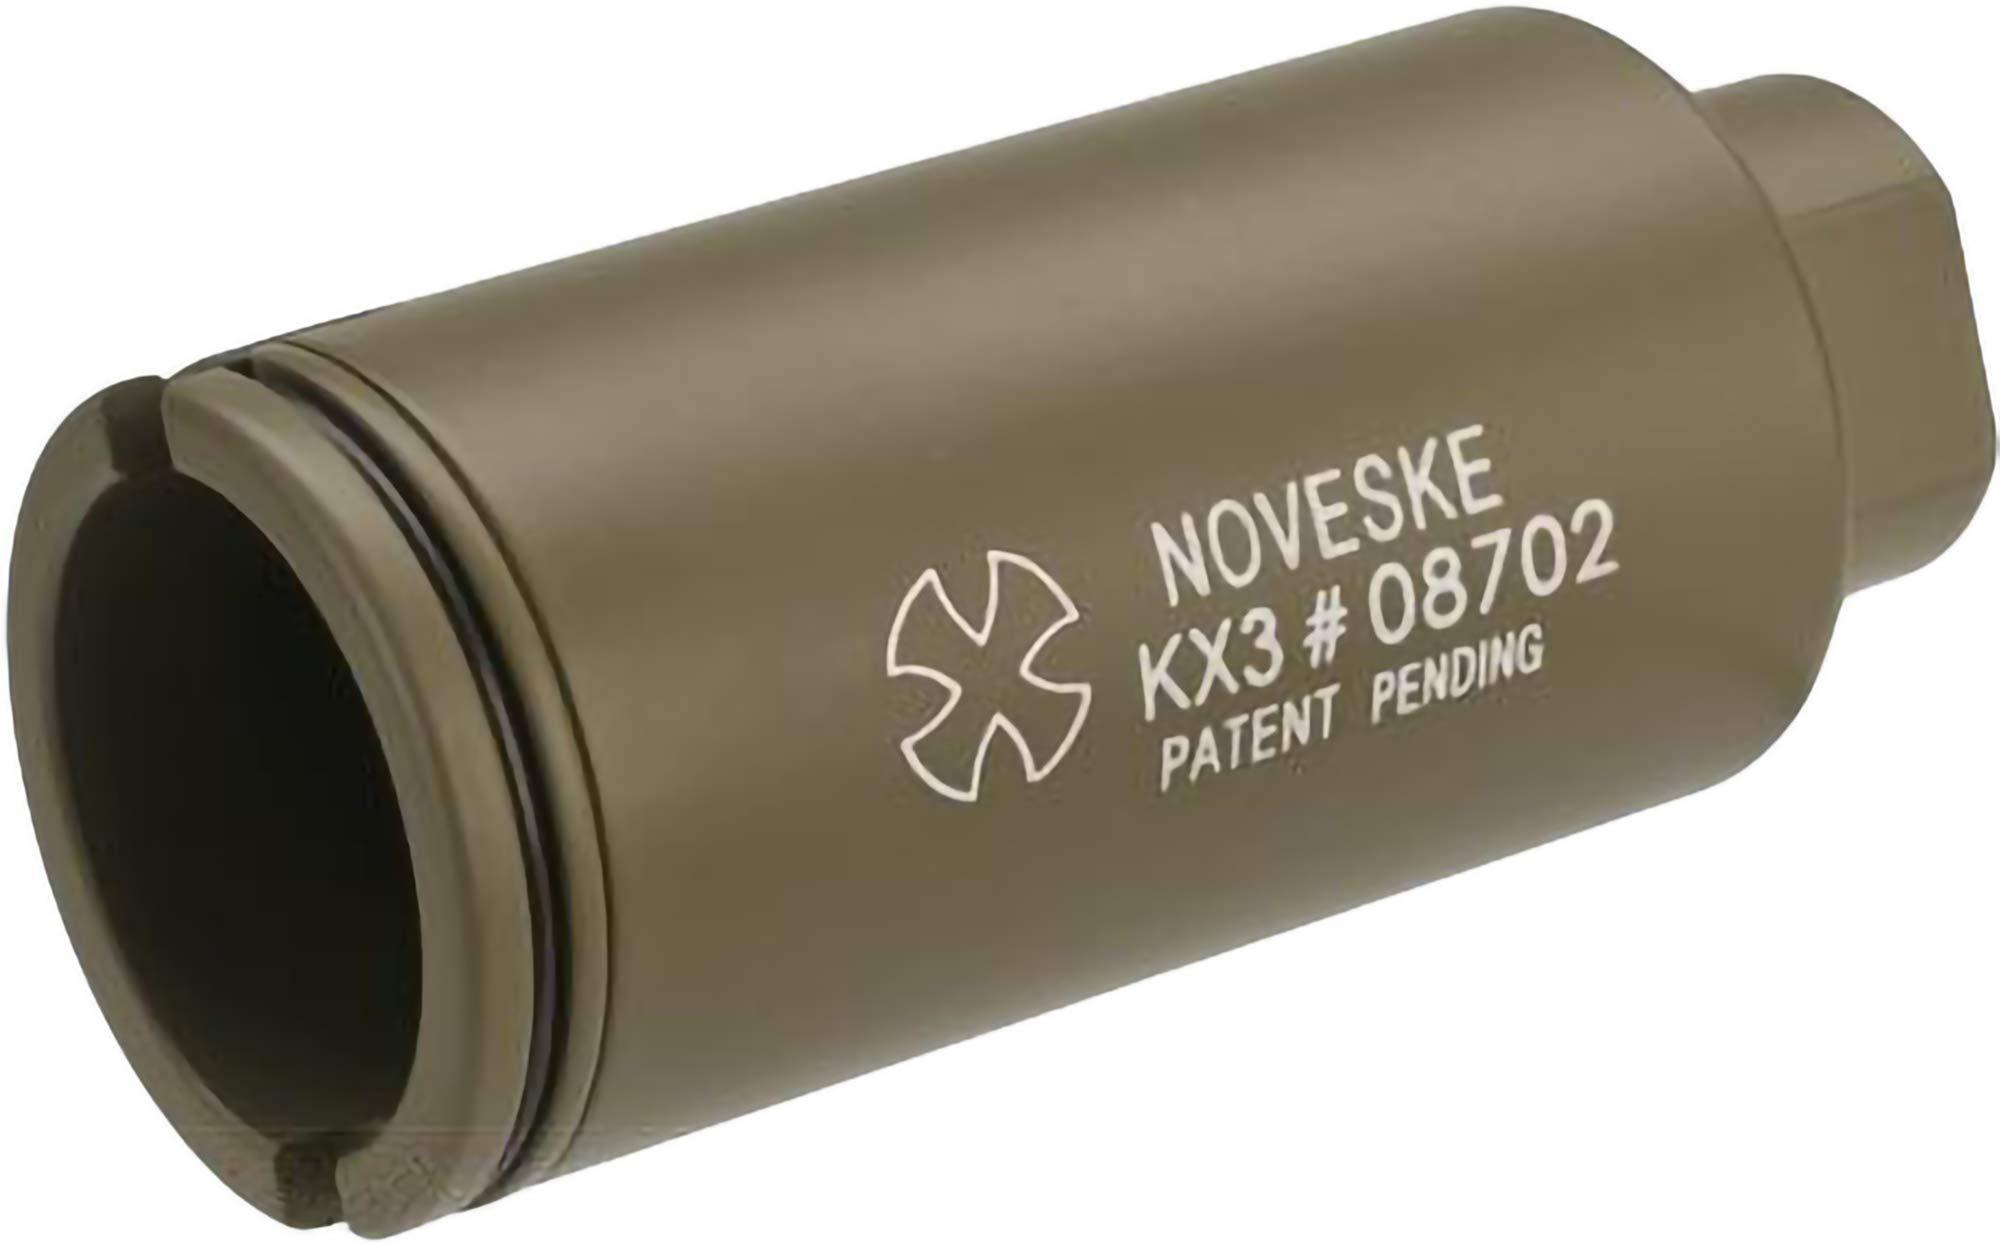 Evike Madbull Noveske KX3 Airsoft Sound Amplifier System (Color: Tan / 14mm Negative) by Evike